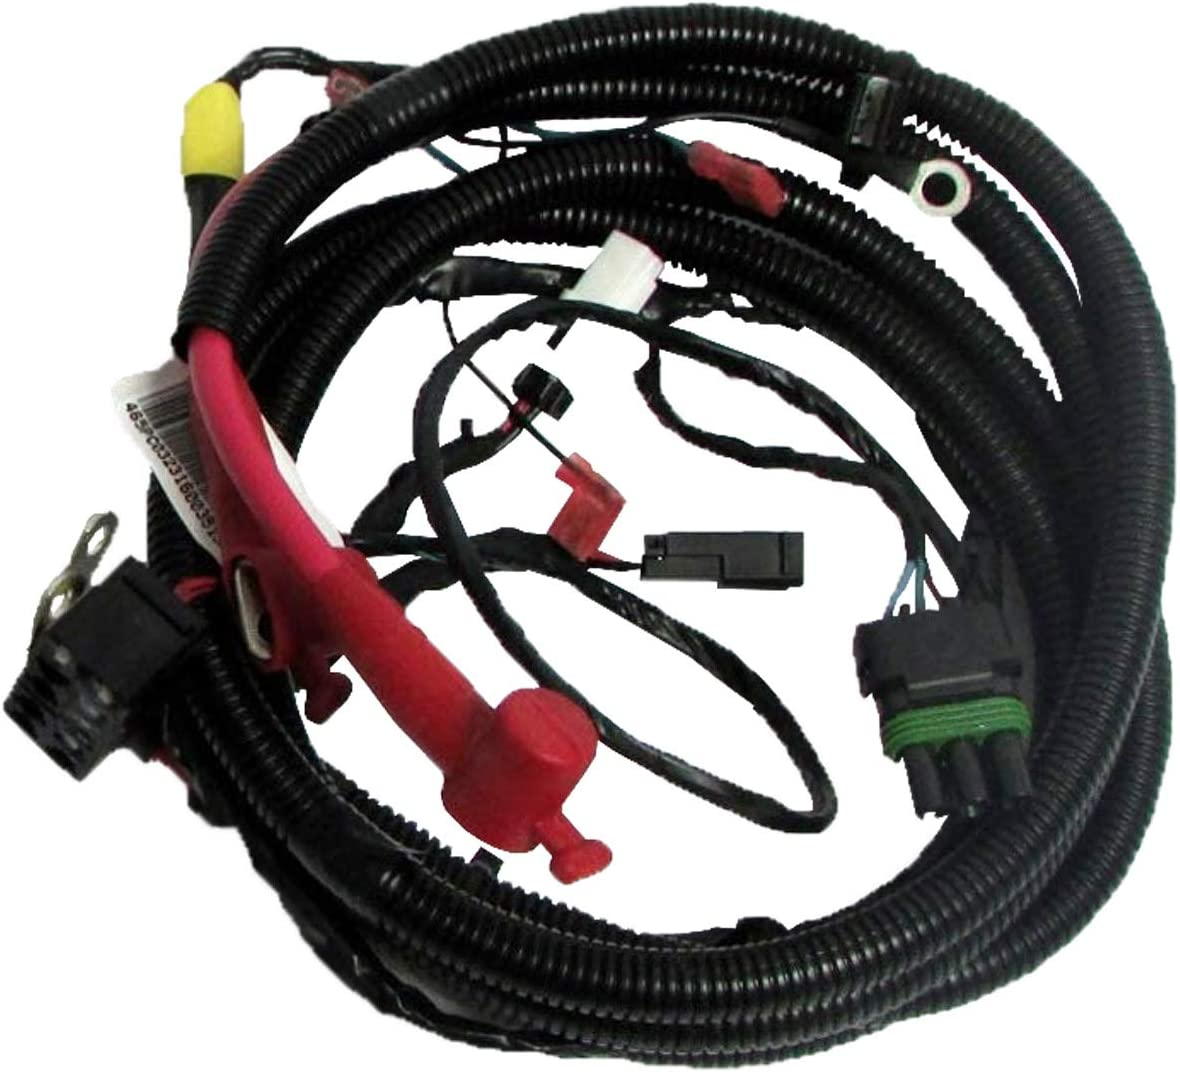 Amazon.com: Can-Am Rear Winch Electrical Harness for Maverick X3, Maverick  X3 MAX 715006007: Automotive   Winch Harness      Amazon.com